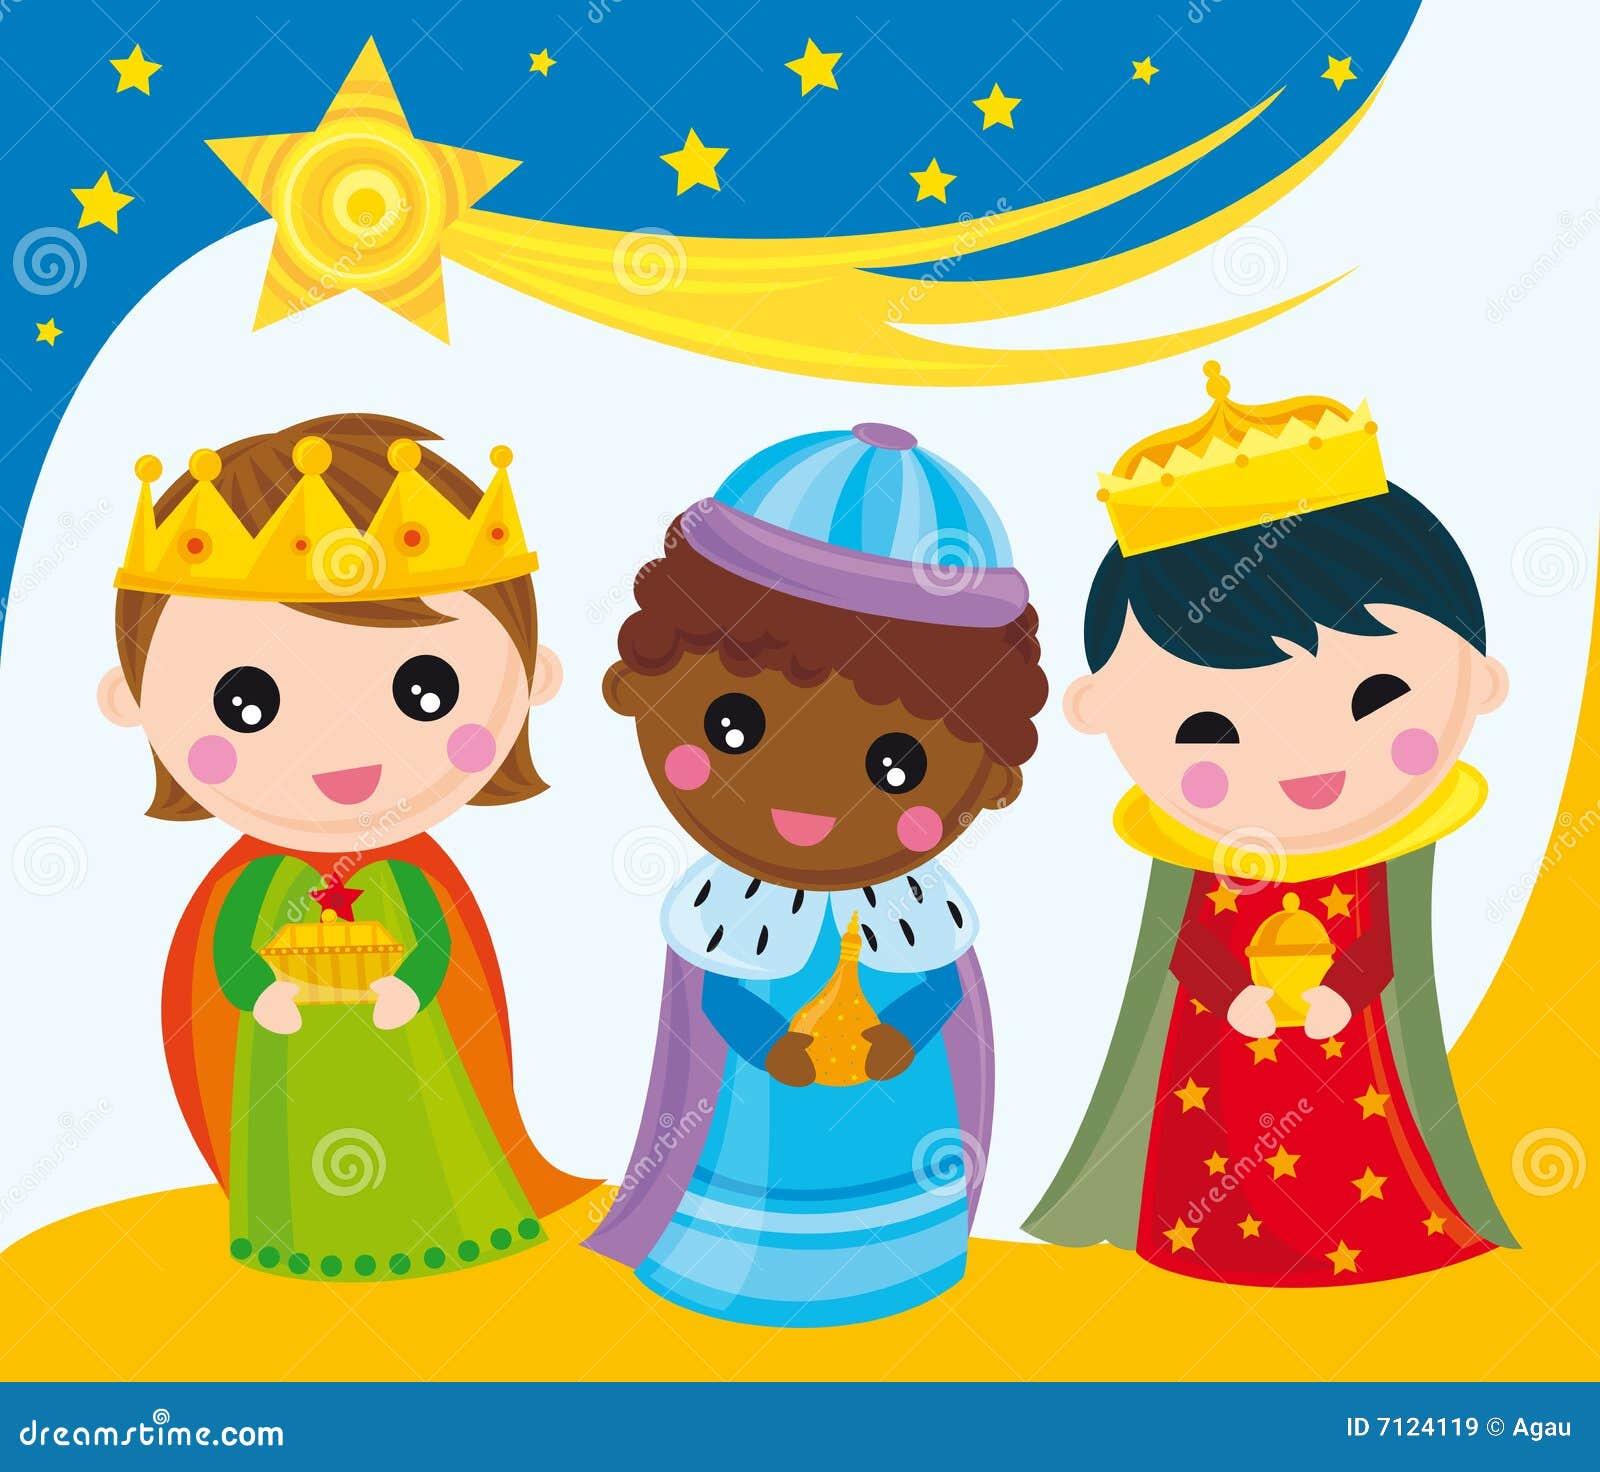 drie koningen vector illustratie afbeelding bestaande uit 3 kings clipart three kings clip art black and white